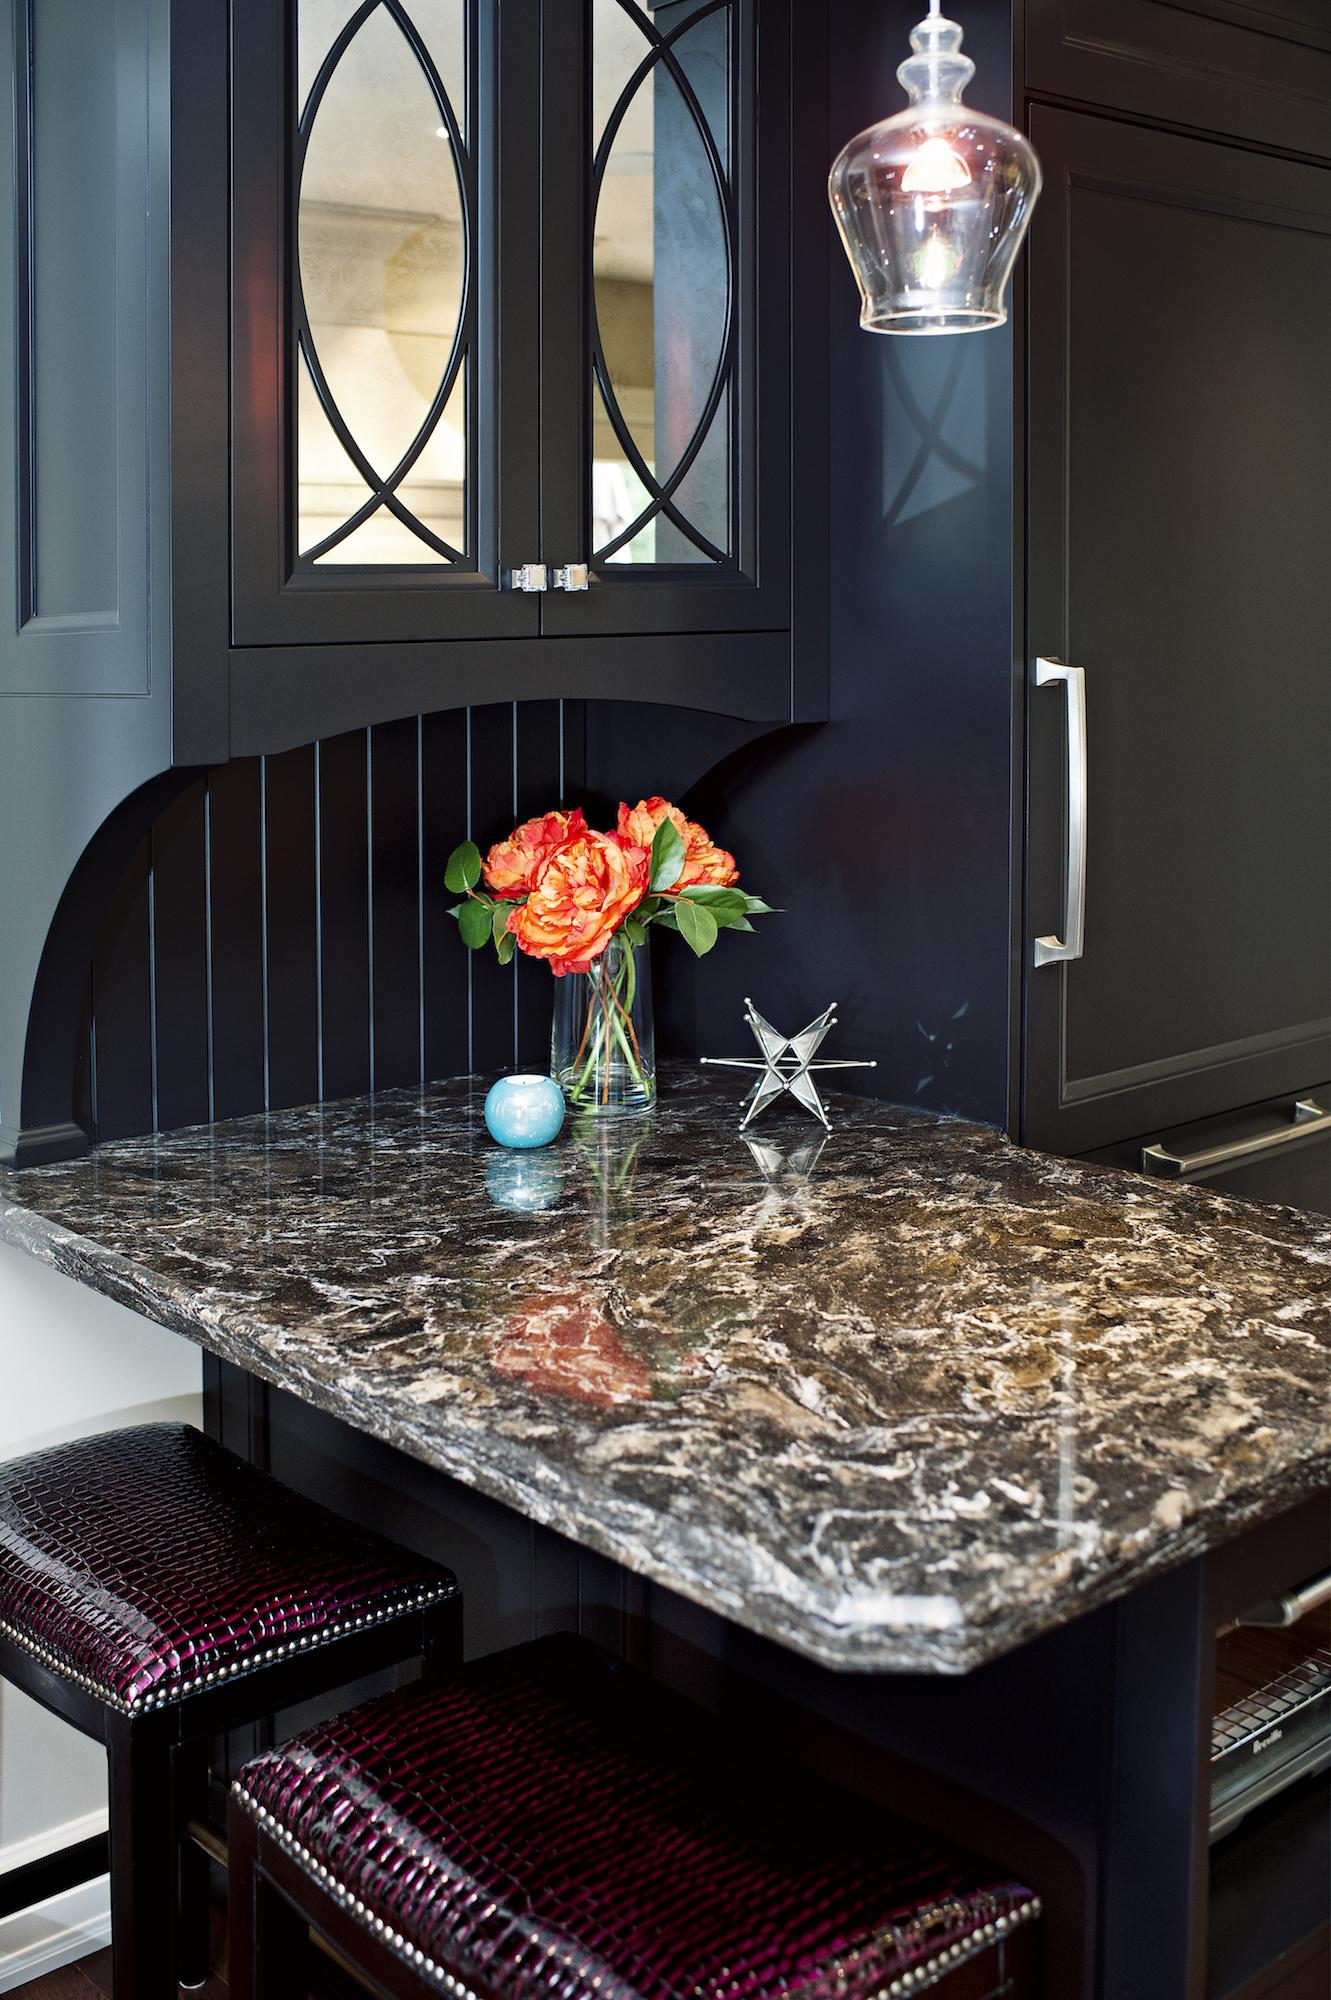 18 Pizzale Design Interior Decorating kitchen quartz black cabinet .jpg